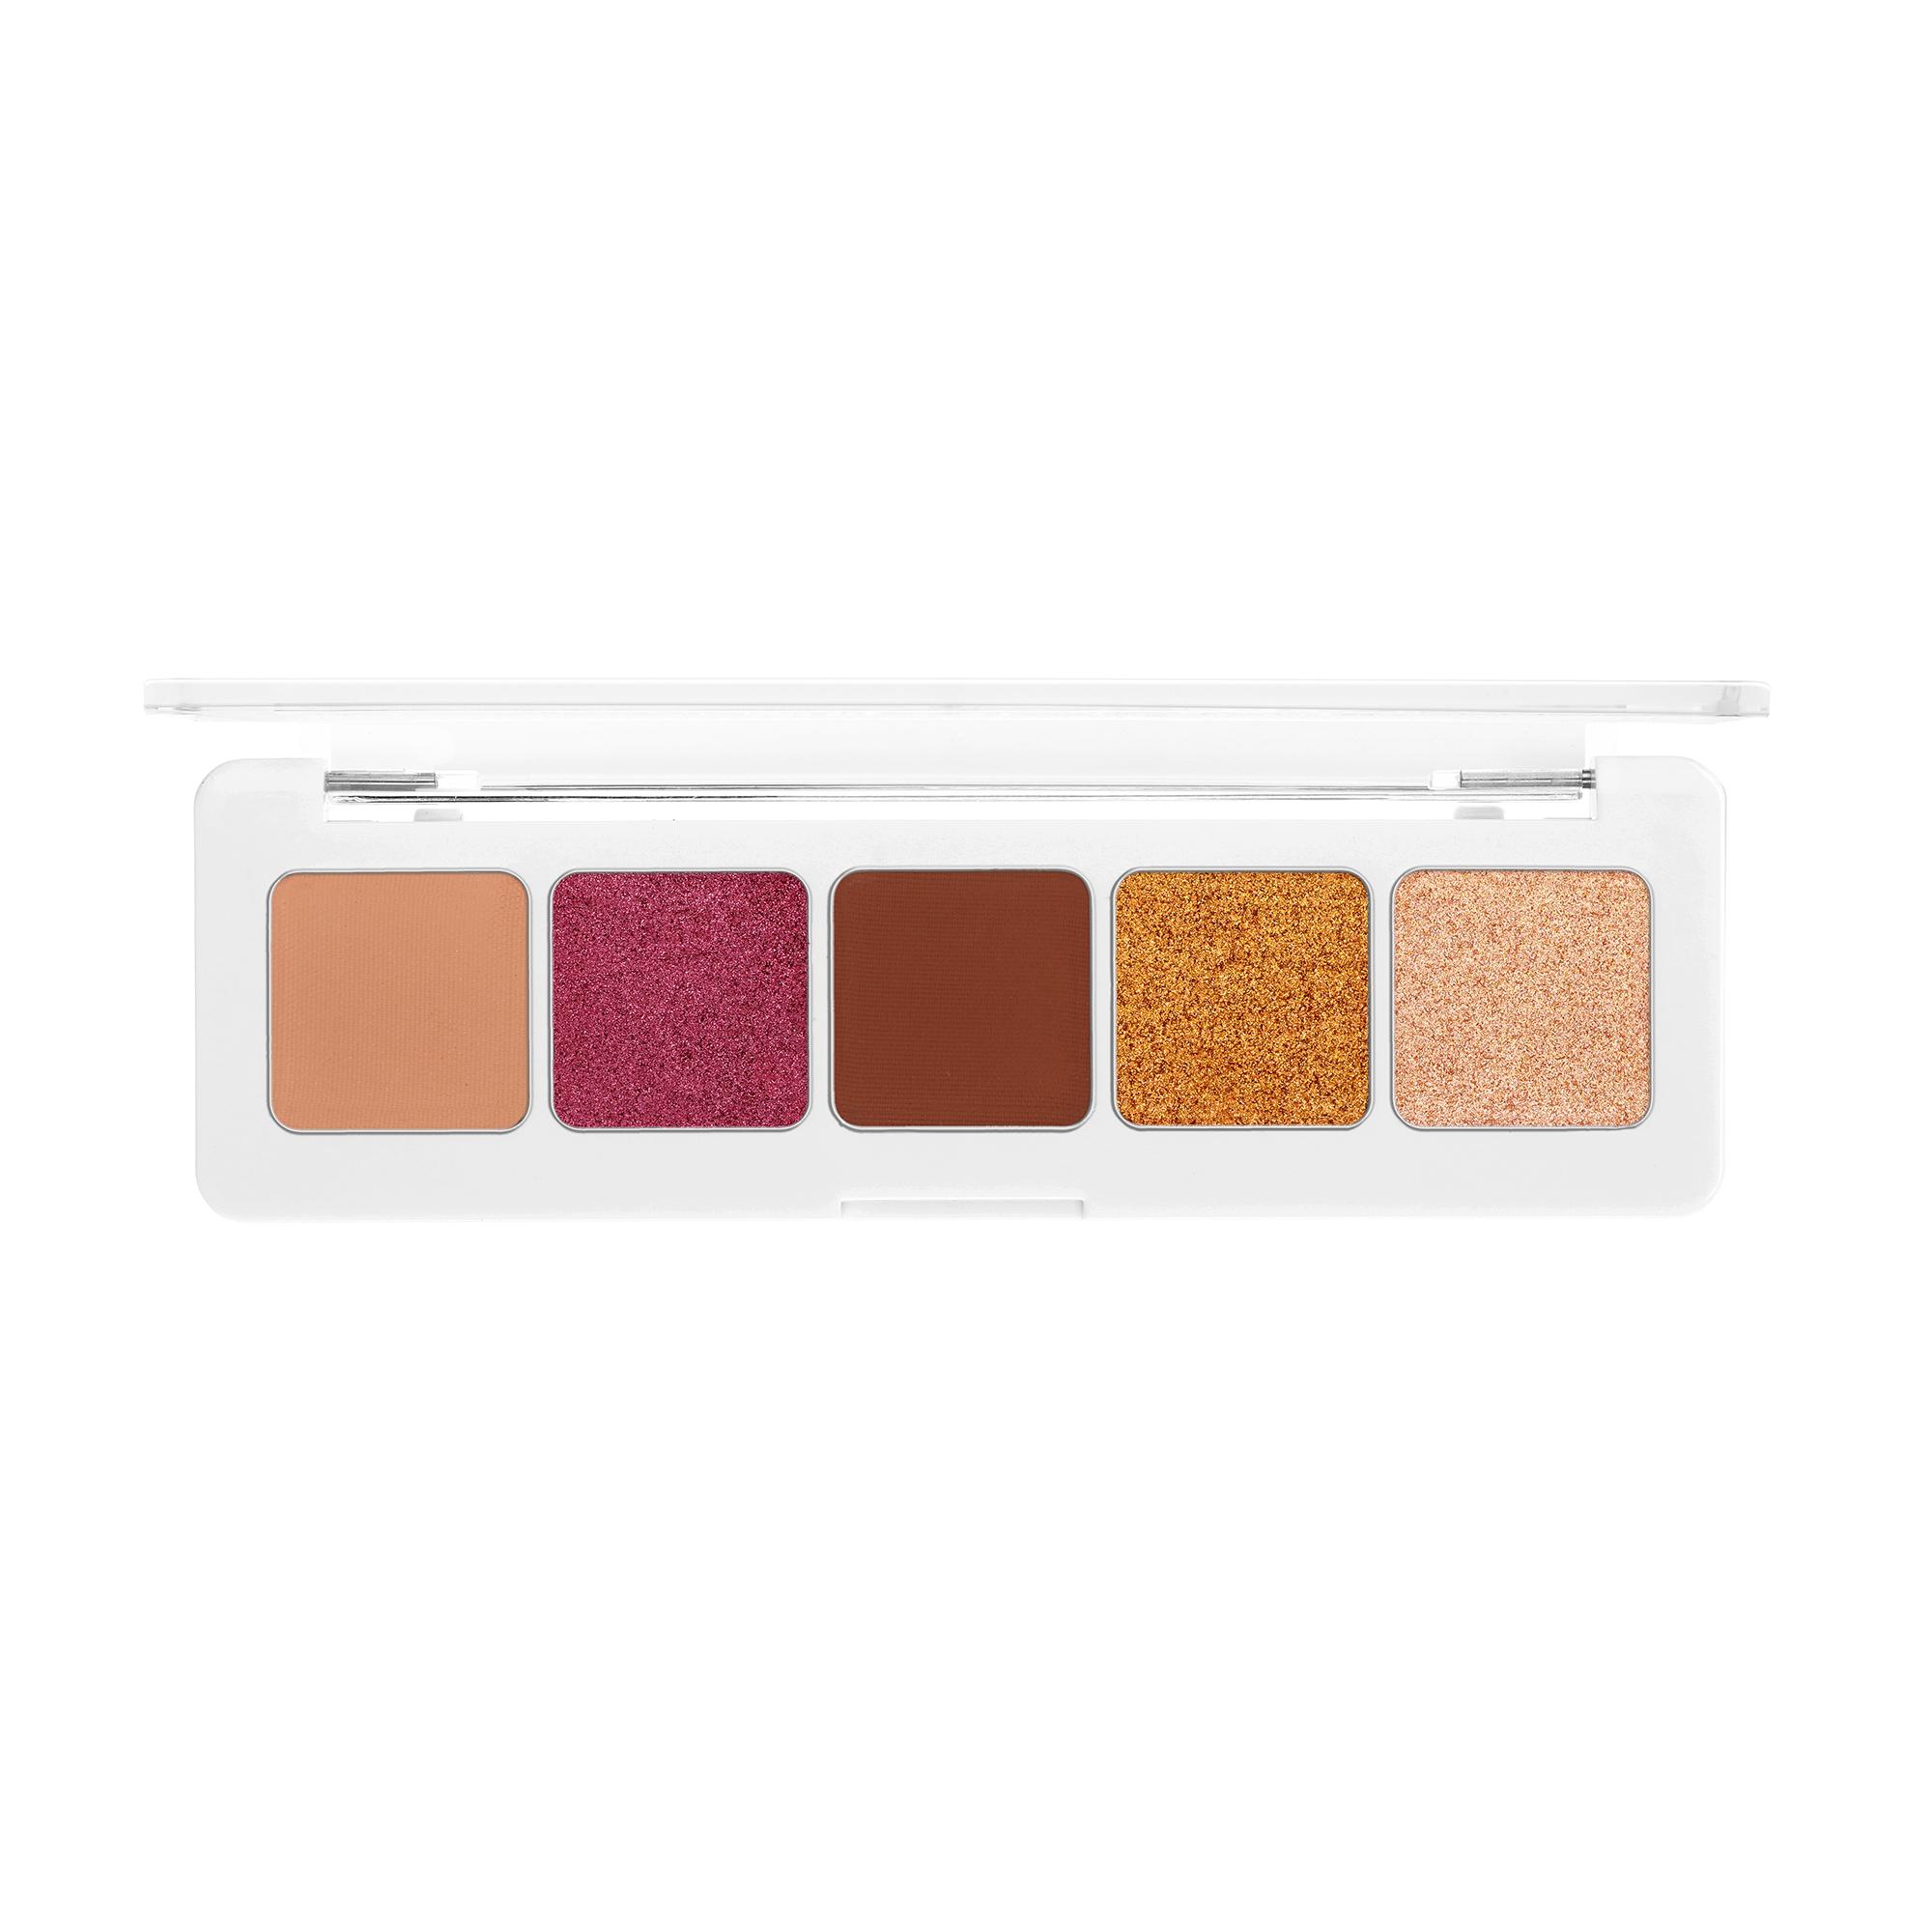 Natasha Denona Mini Sunset Eyeshadow Palette - $25 at Sephora